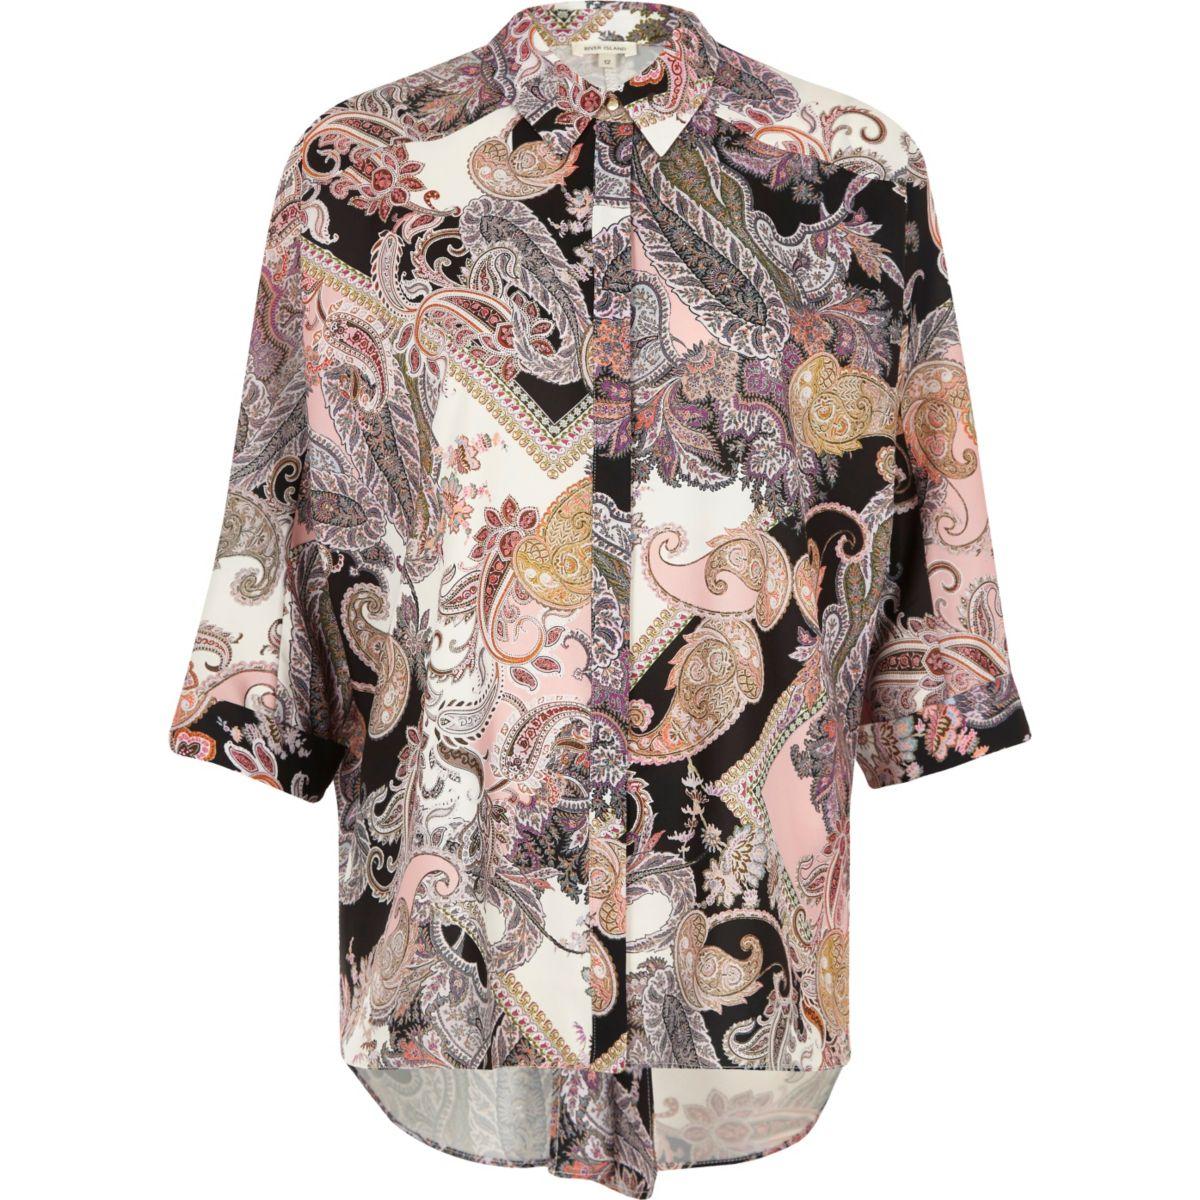 Pinkes Hemd mit Paisley-Muster